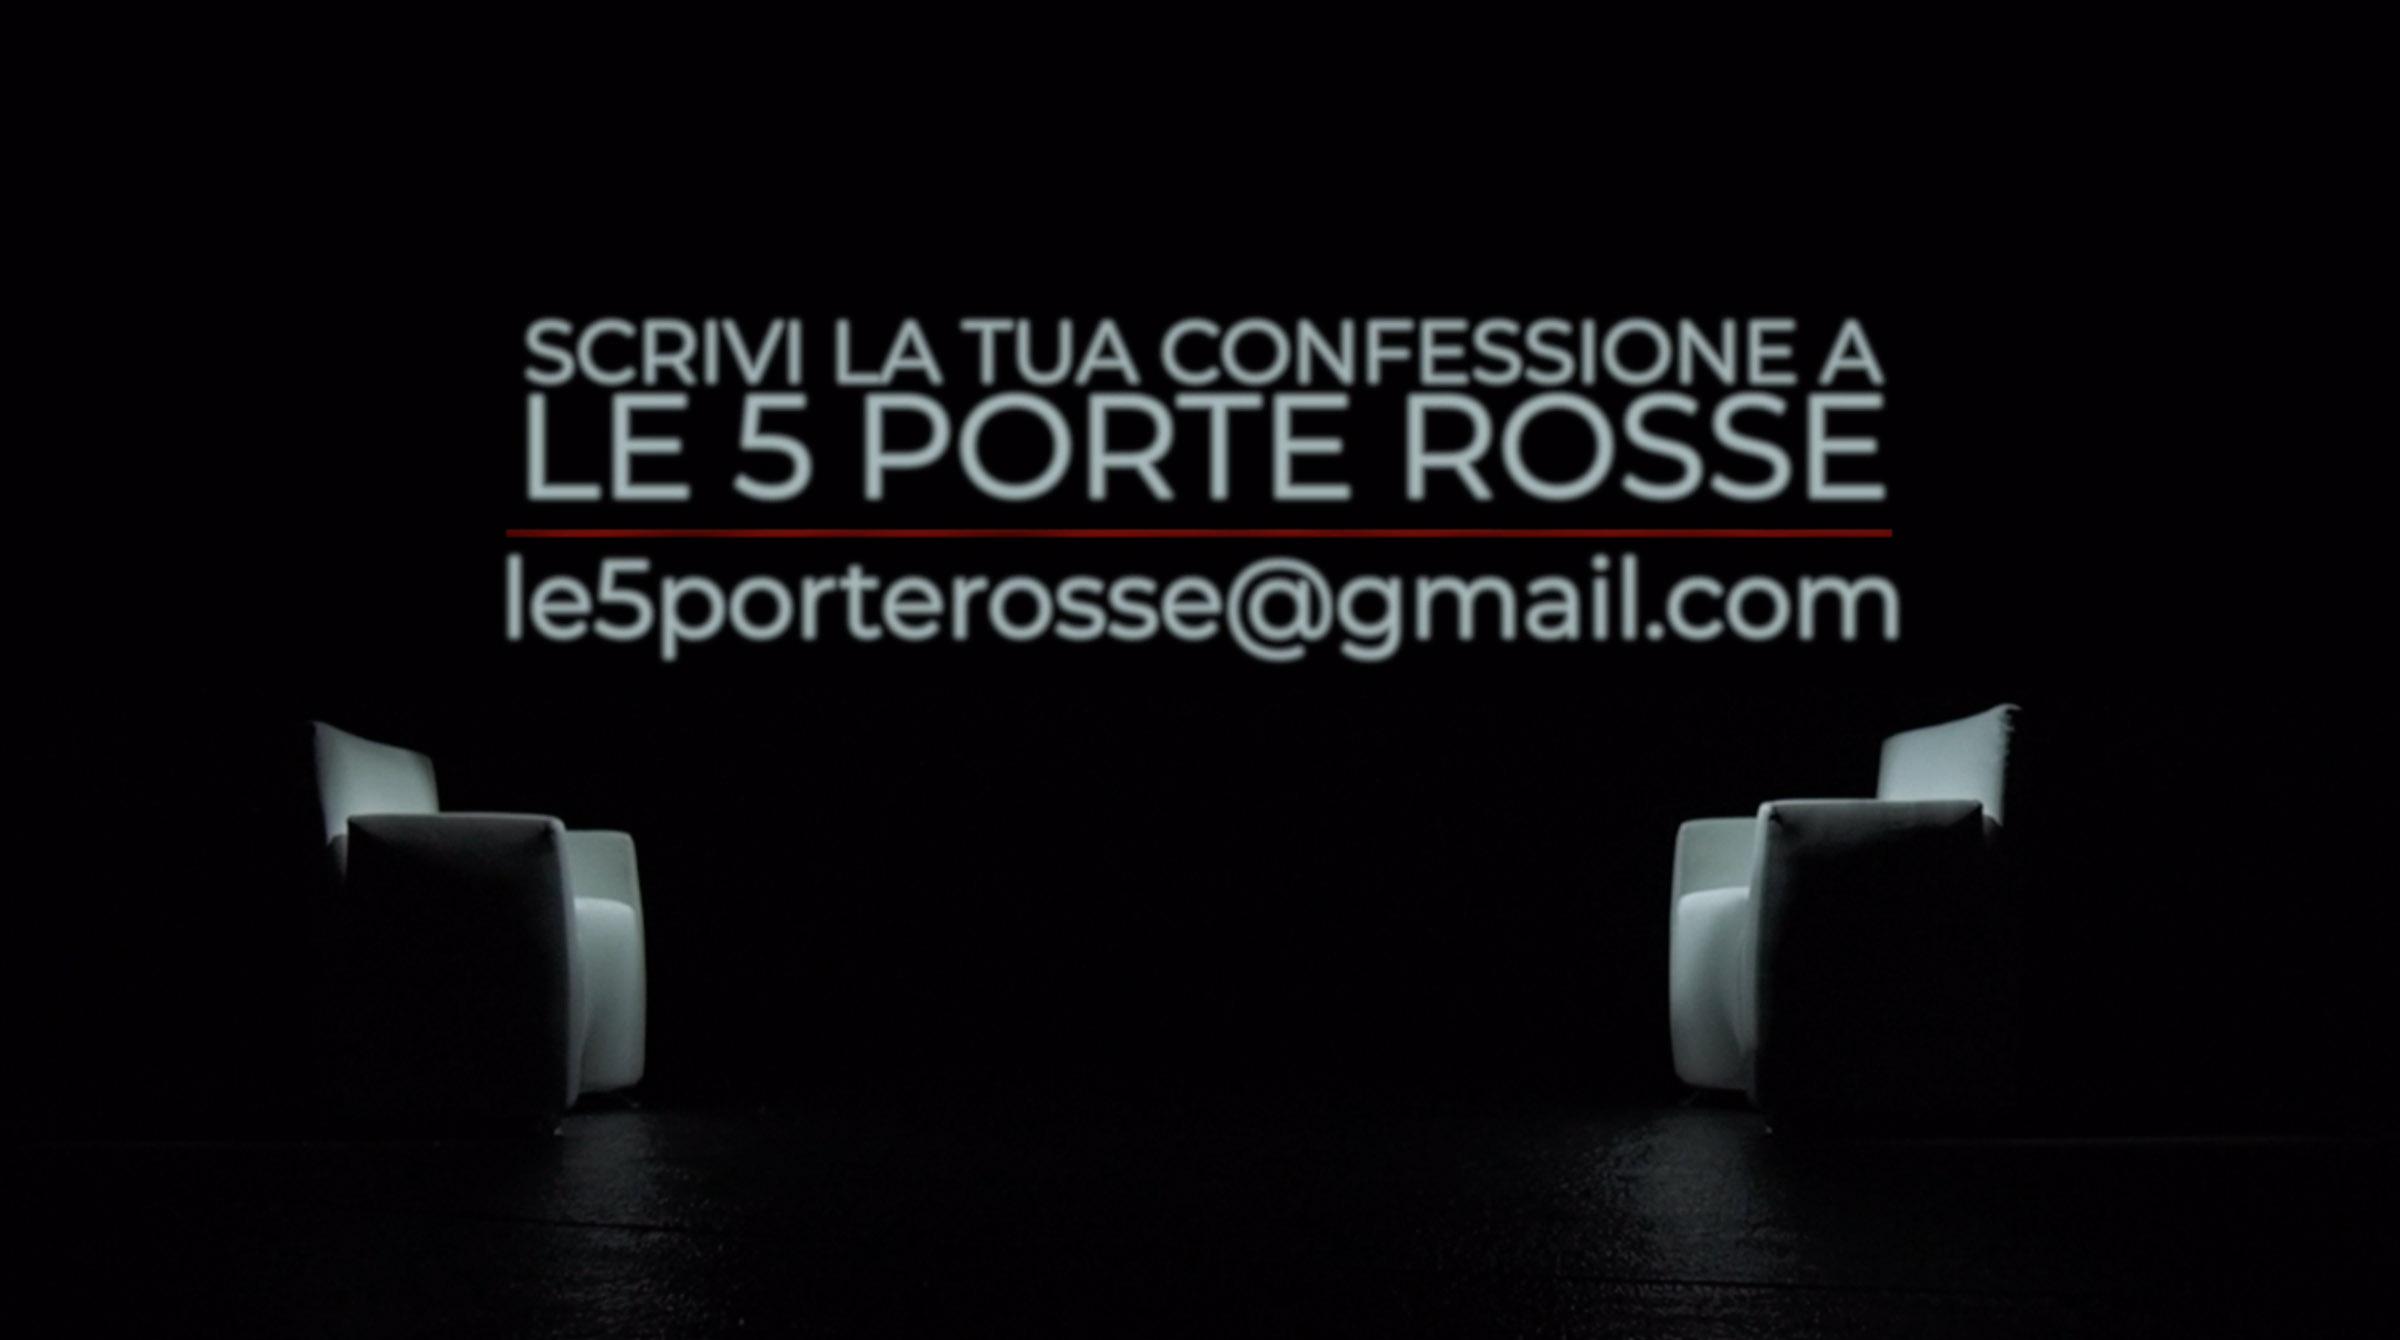 le5porterosse-slider-scrivi12gennaio